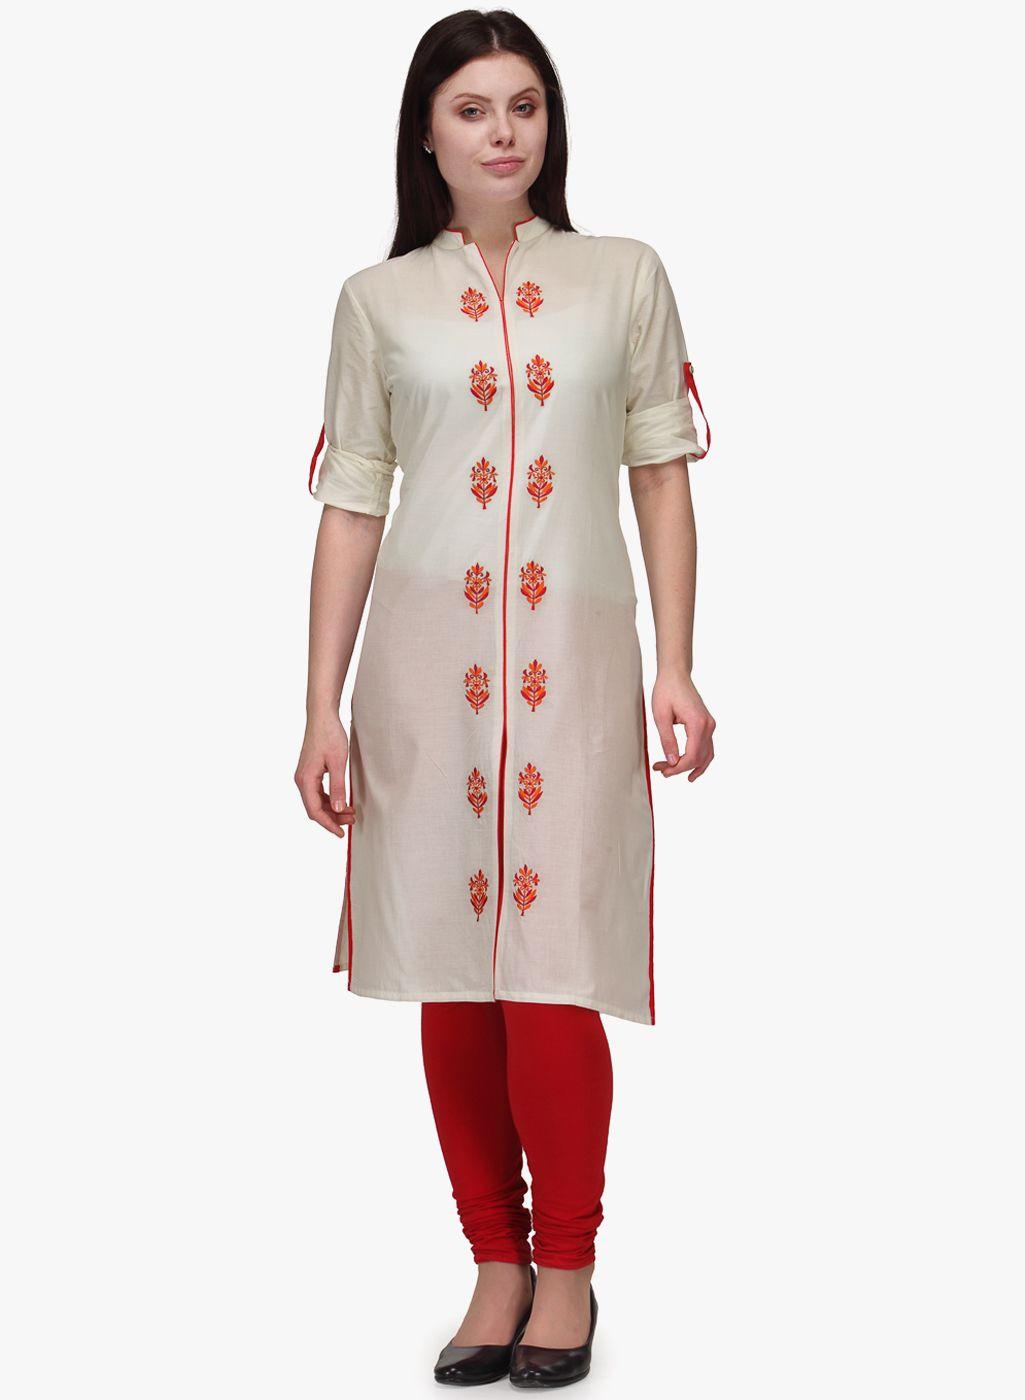 Buy Tulsattva Cream Embroidered Kurta for Women Online India, Best Prices,  Reviews | TU219WA22WIRINDFAS